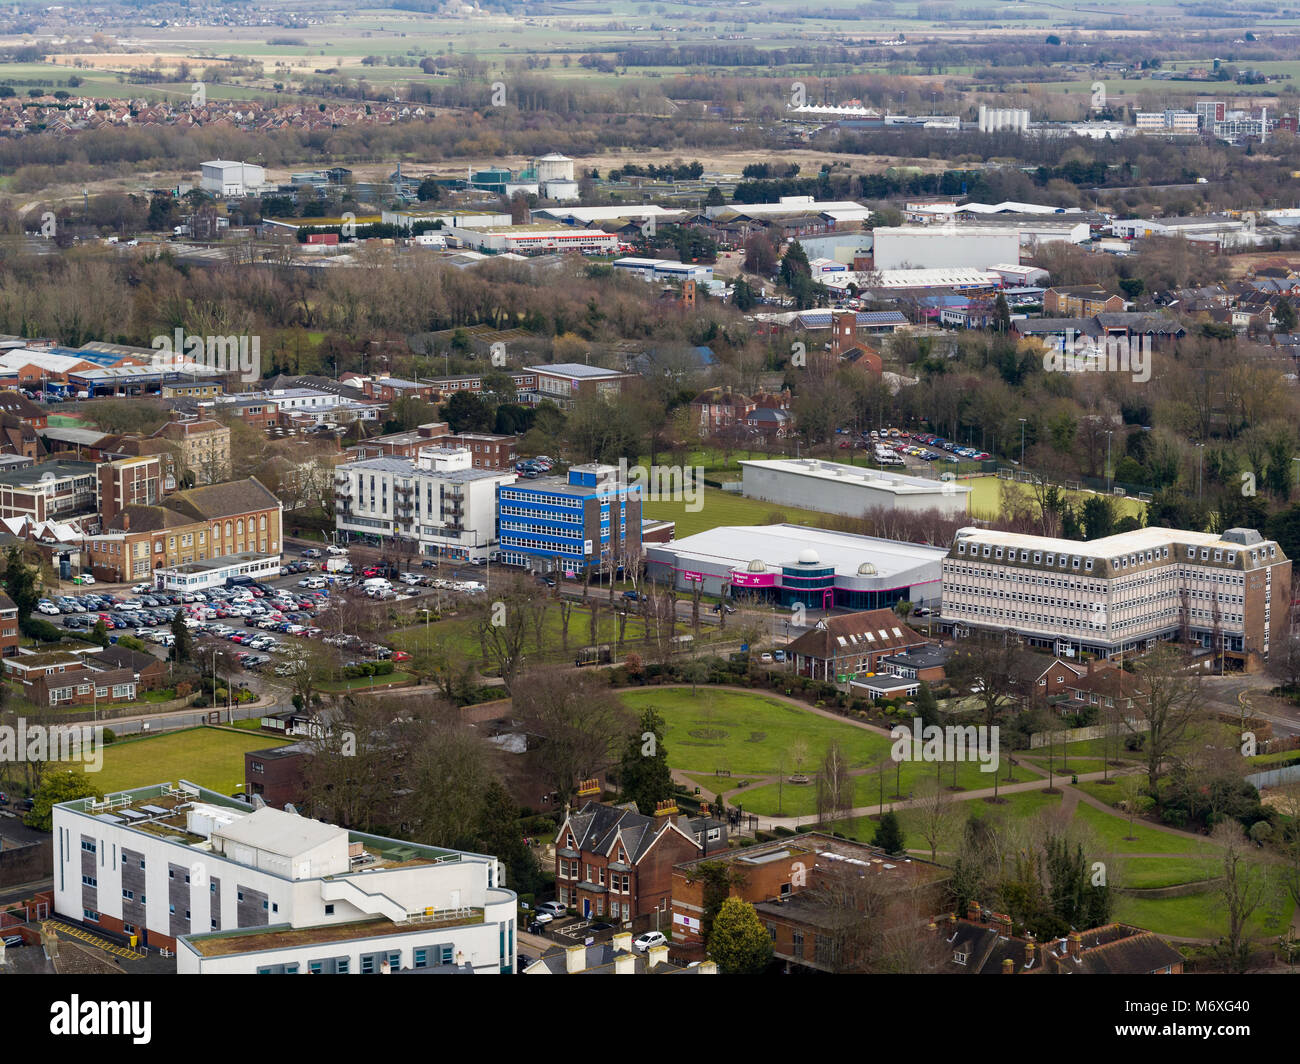 Aerial view of Ashford, Kent, UK Stock Photo